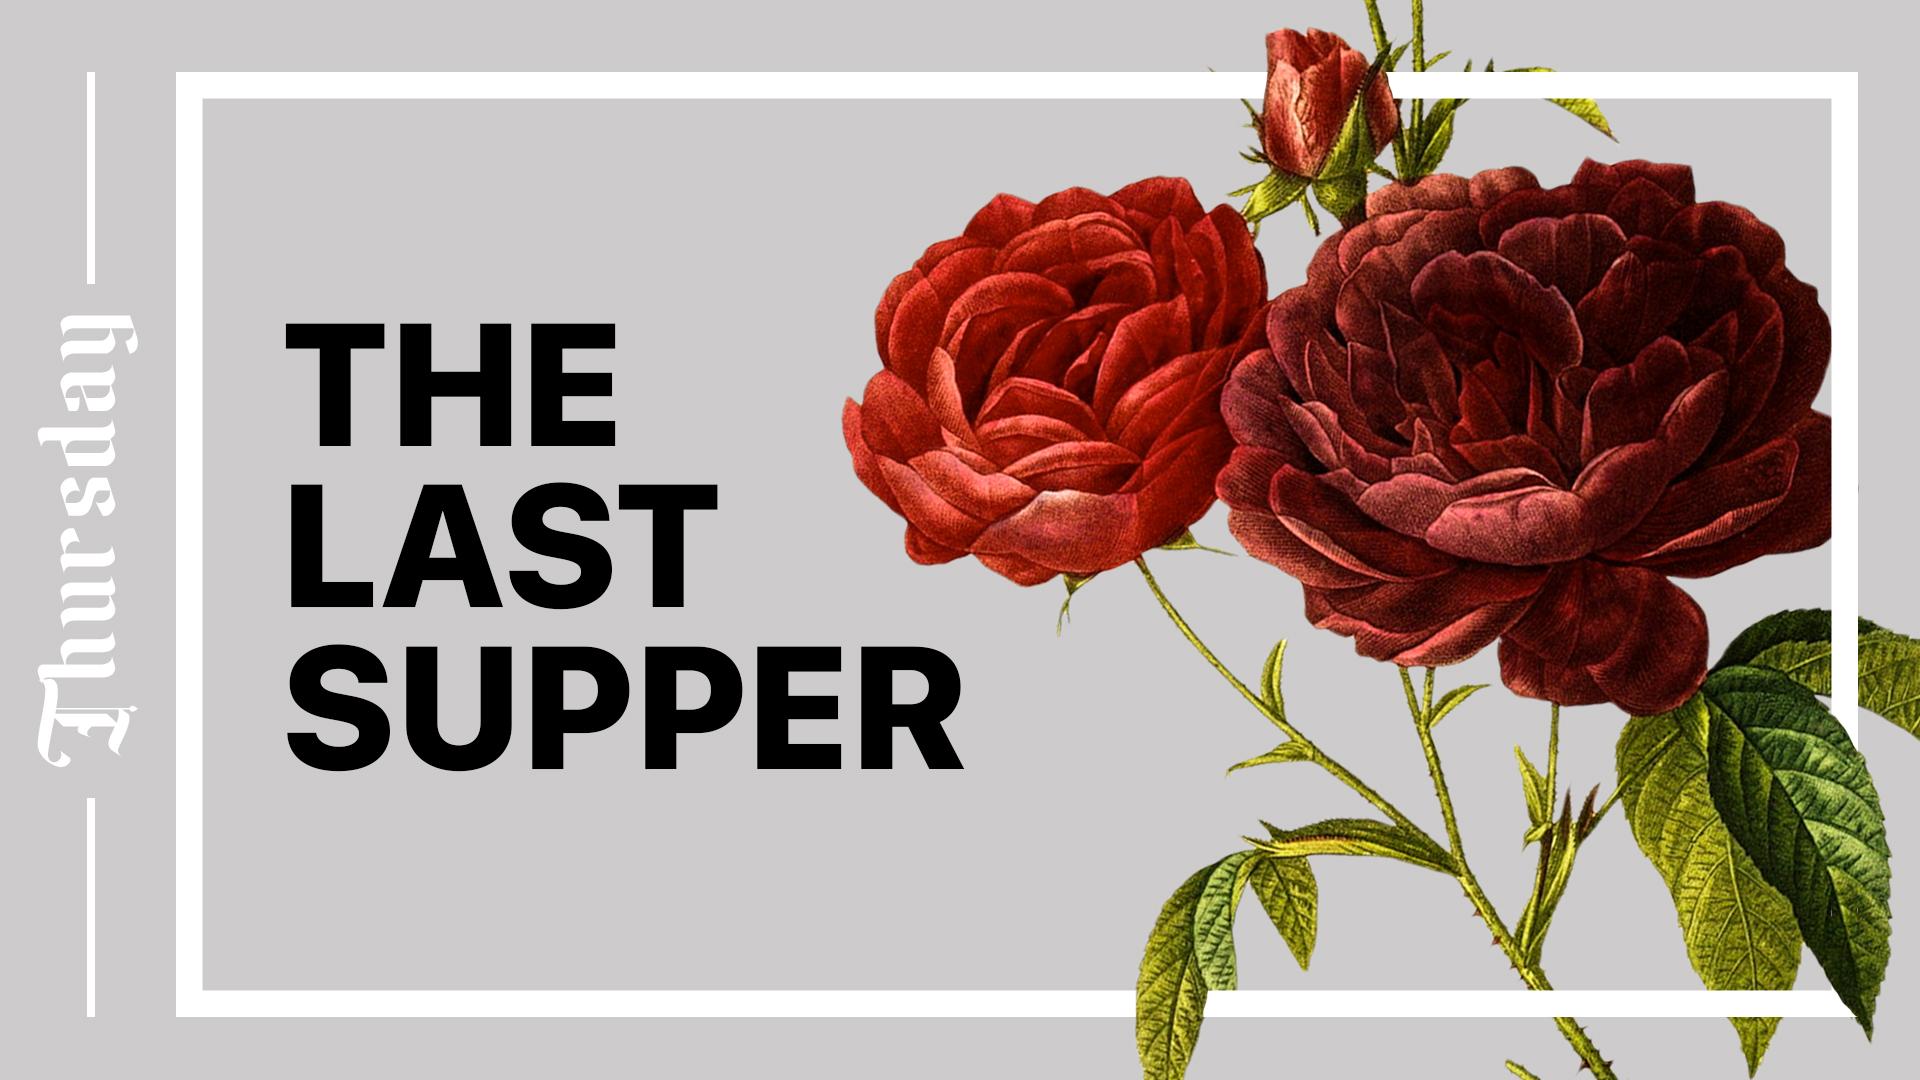 The Last Supper Hero Image